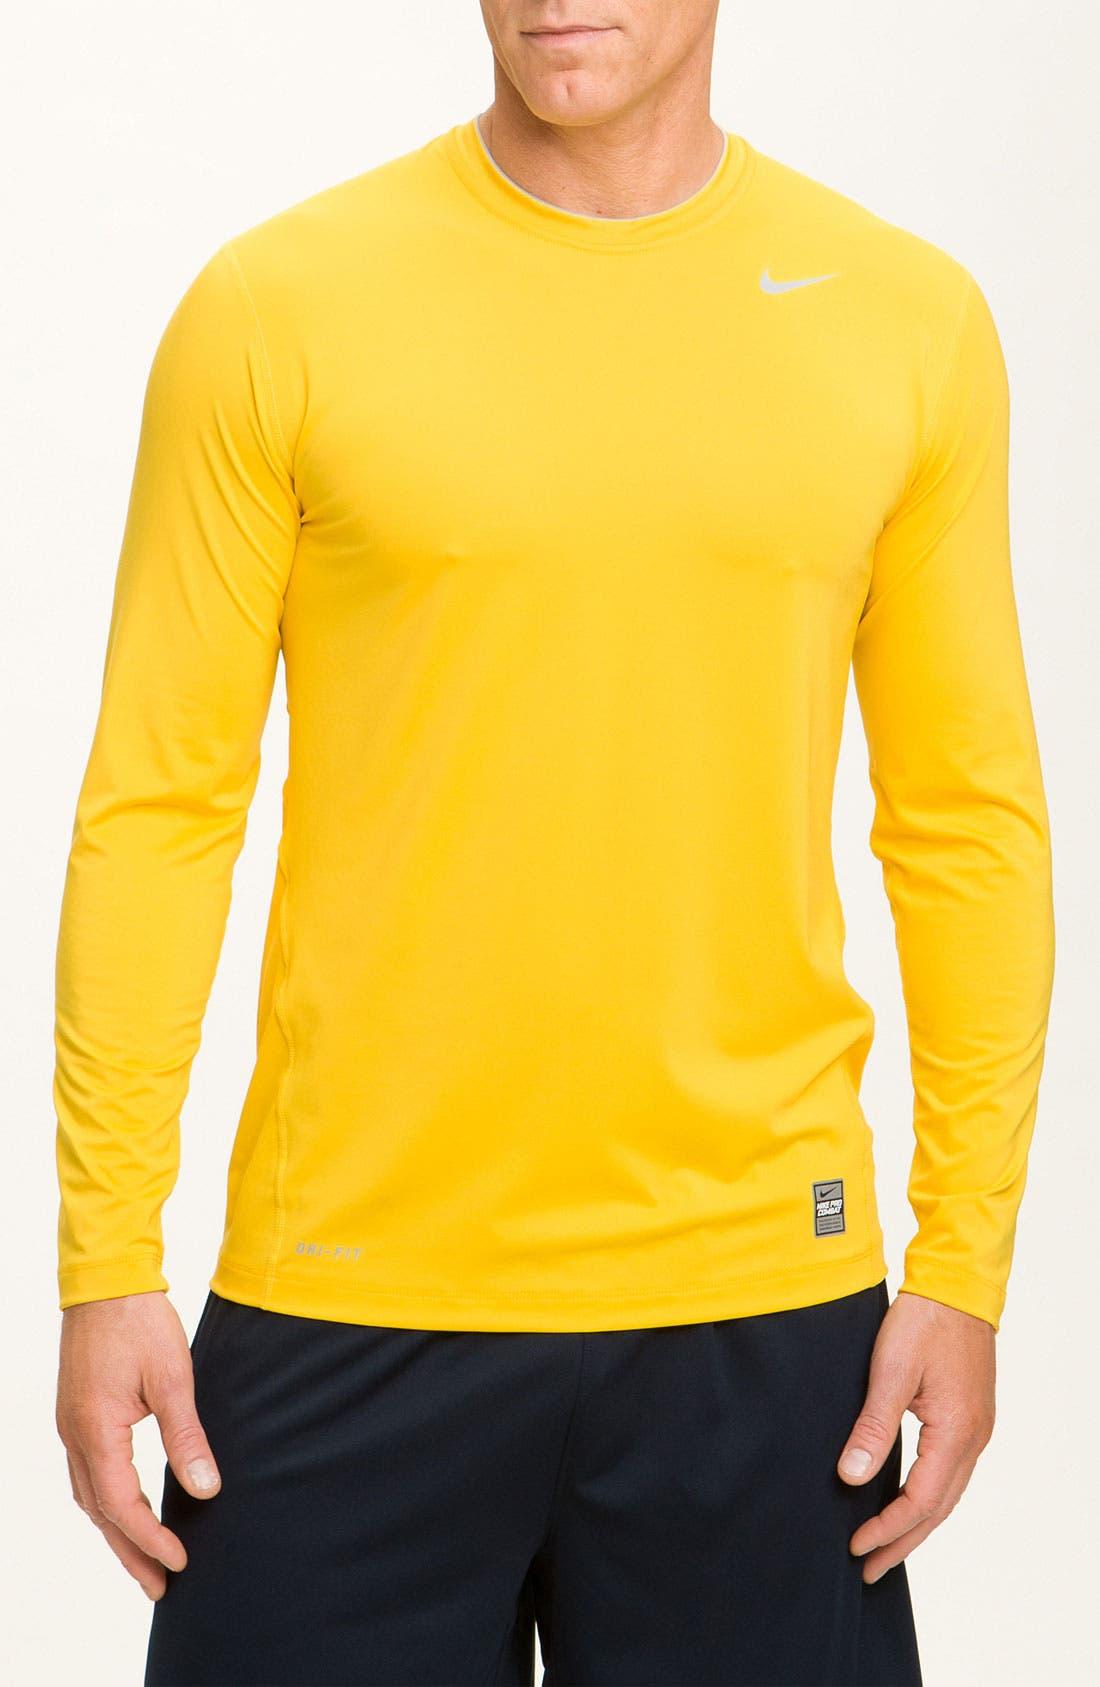 'Pro Combat' Dri-FIT Fitted Shirt,                             Main thumbnail 1, color,                             Varsity Maize/ Matte Silver